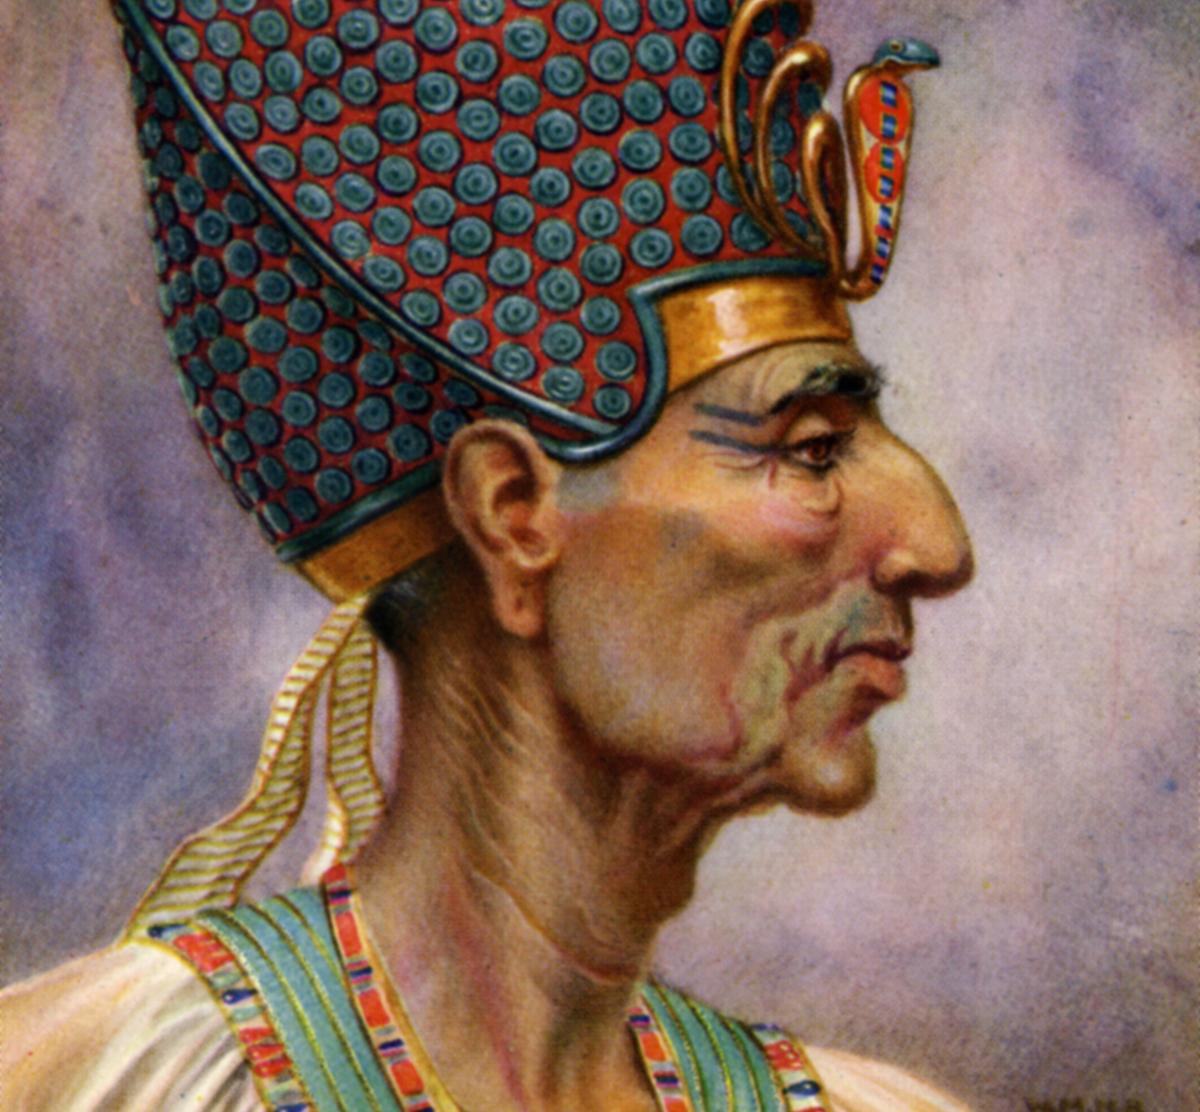 Rameses II, Ancient Egyptian pharaoh of the 19th Dynasty, 13th century BC (1926).